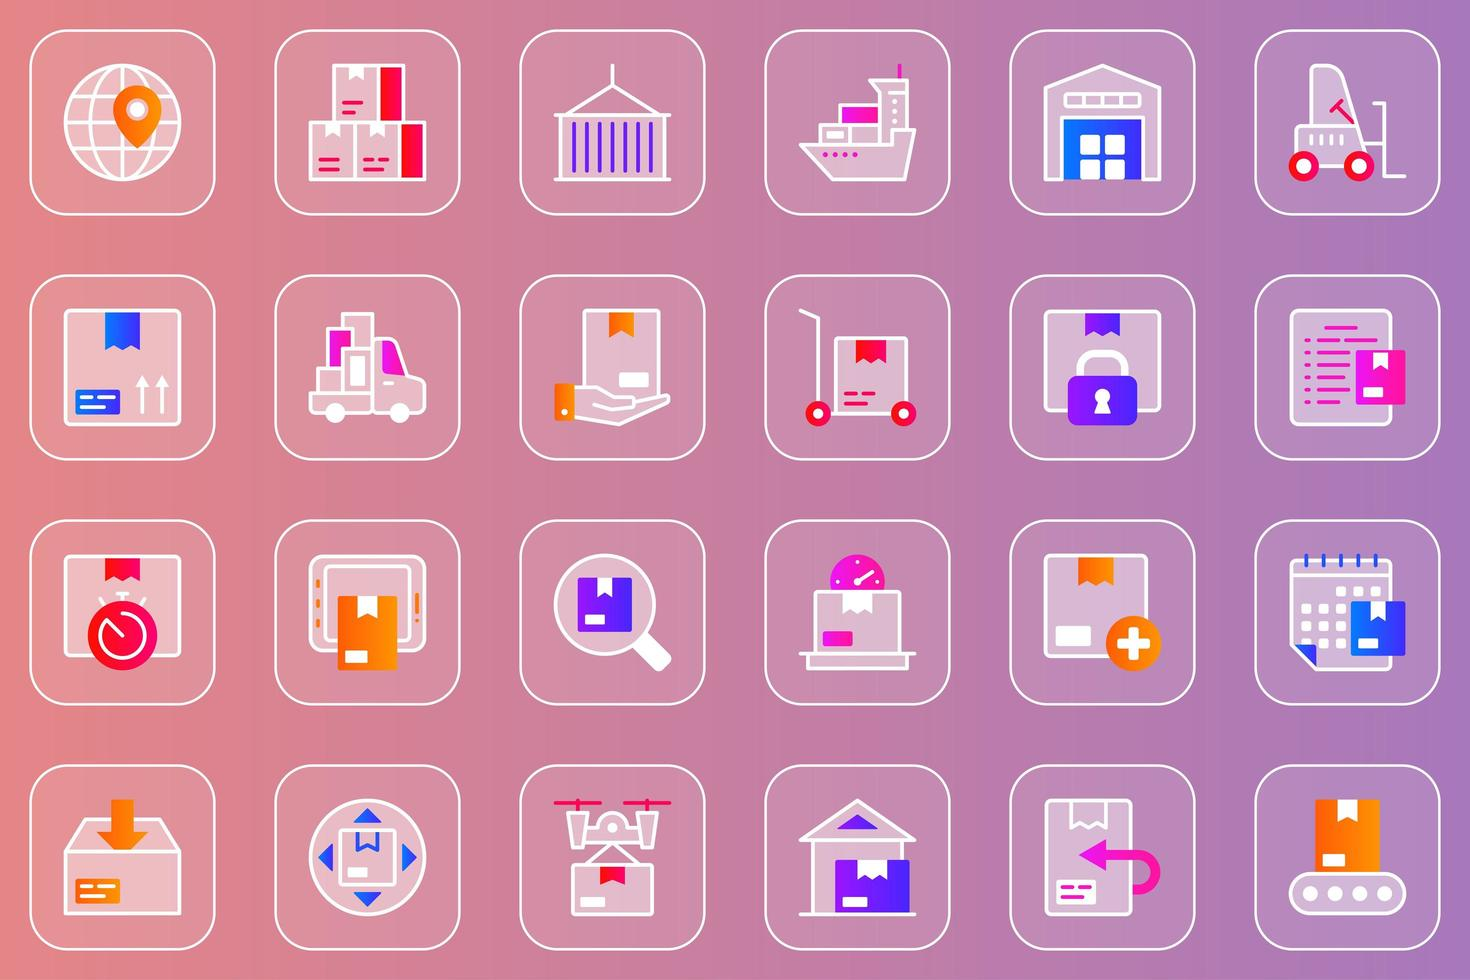 conjunto de ícones do serviço de entrega web glassmorphic vetor